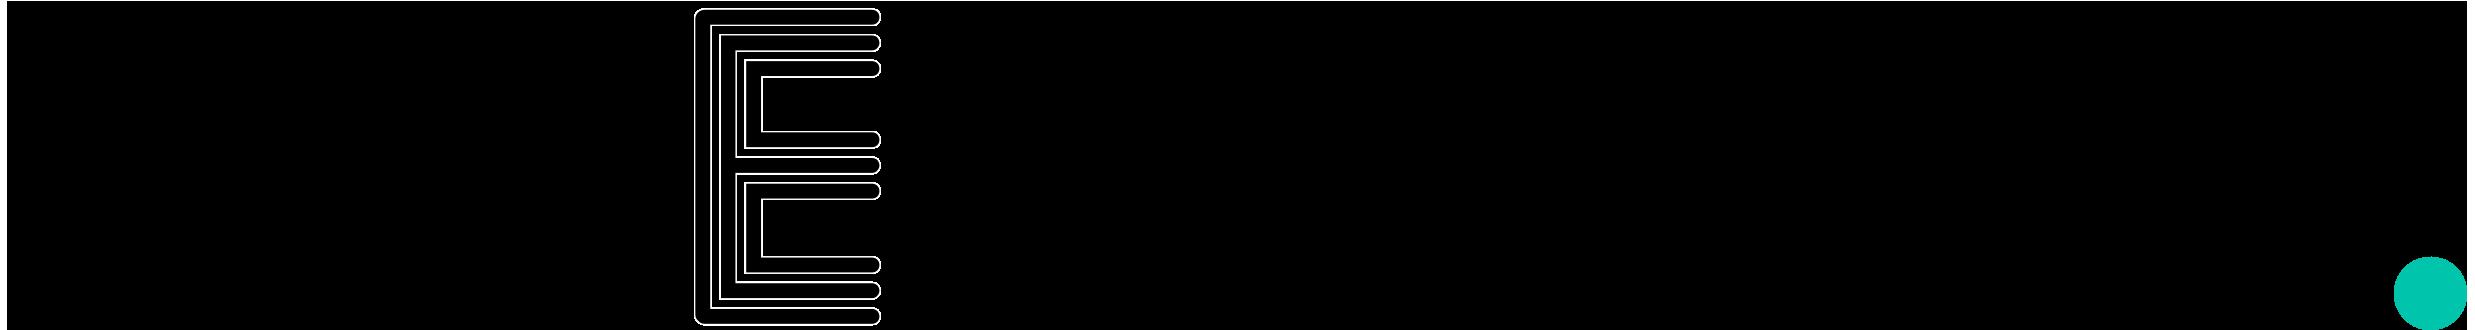 ONENIGMA